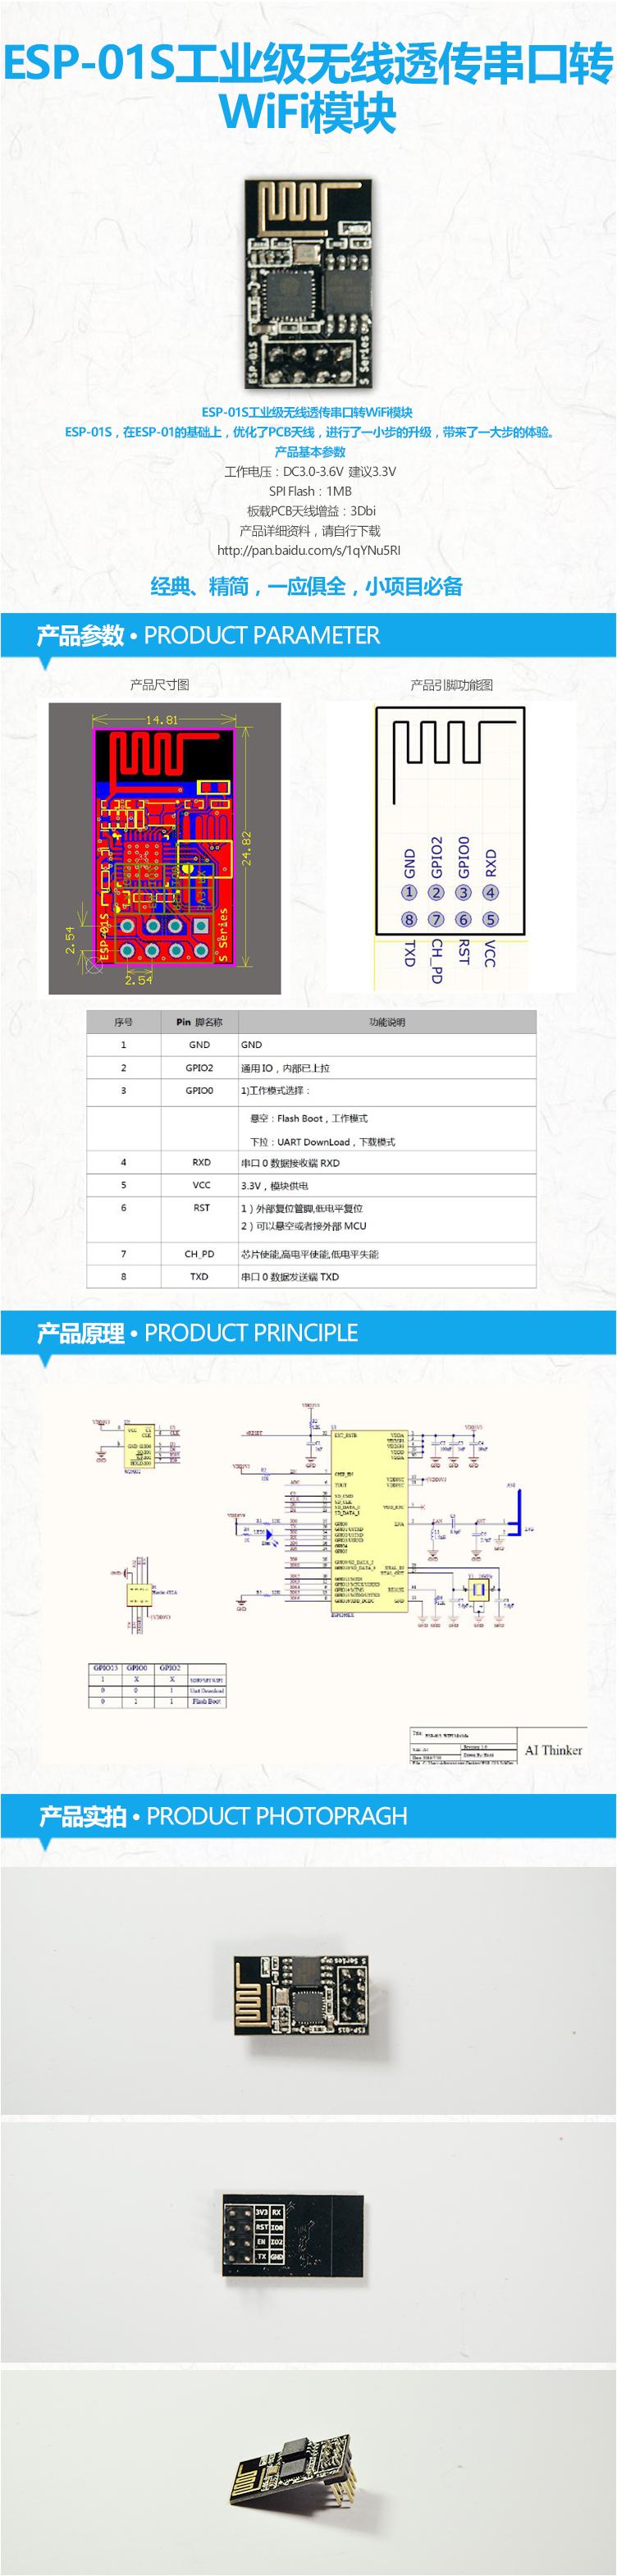 ESP-01S 无线透传工业级 ESP8266串口转WiFi模块 智能家居 物联网-淘宝网副本.png